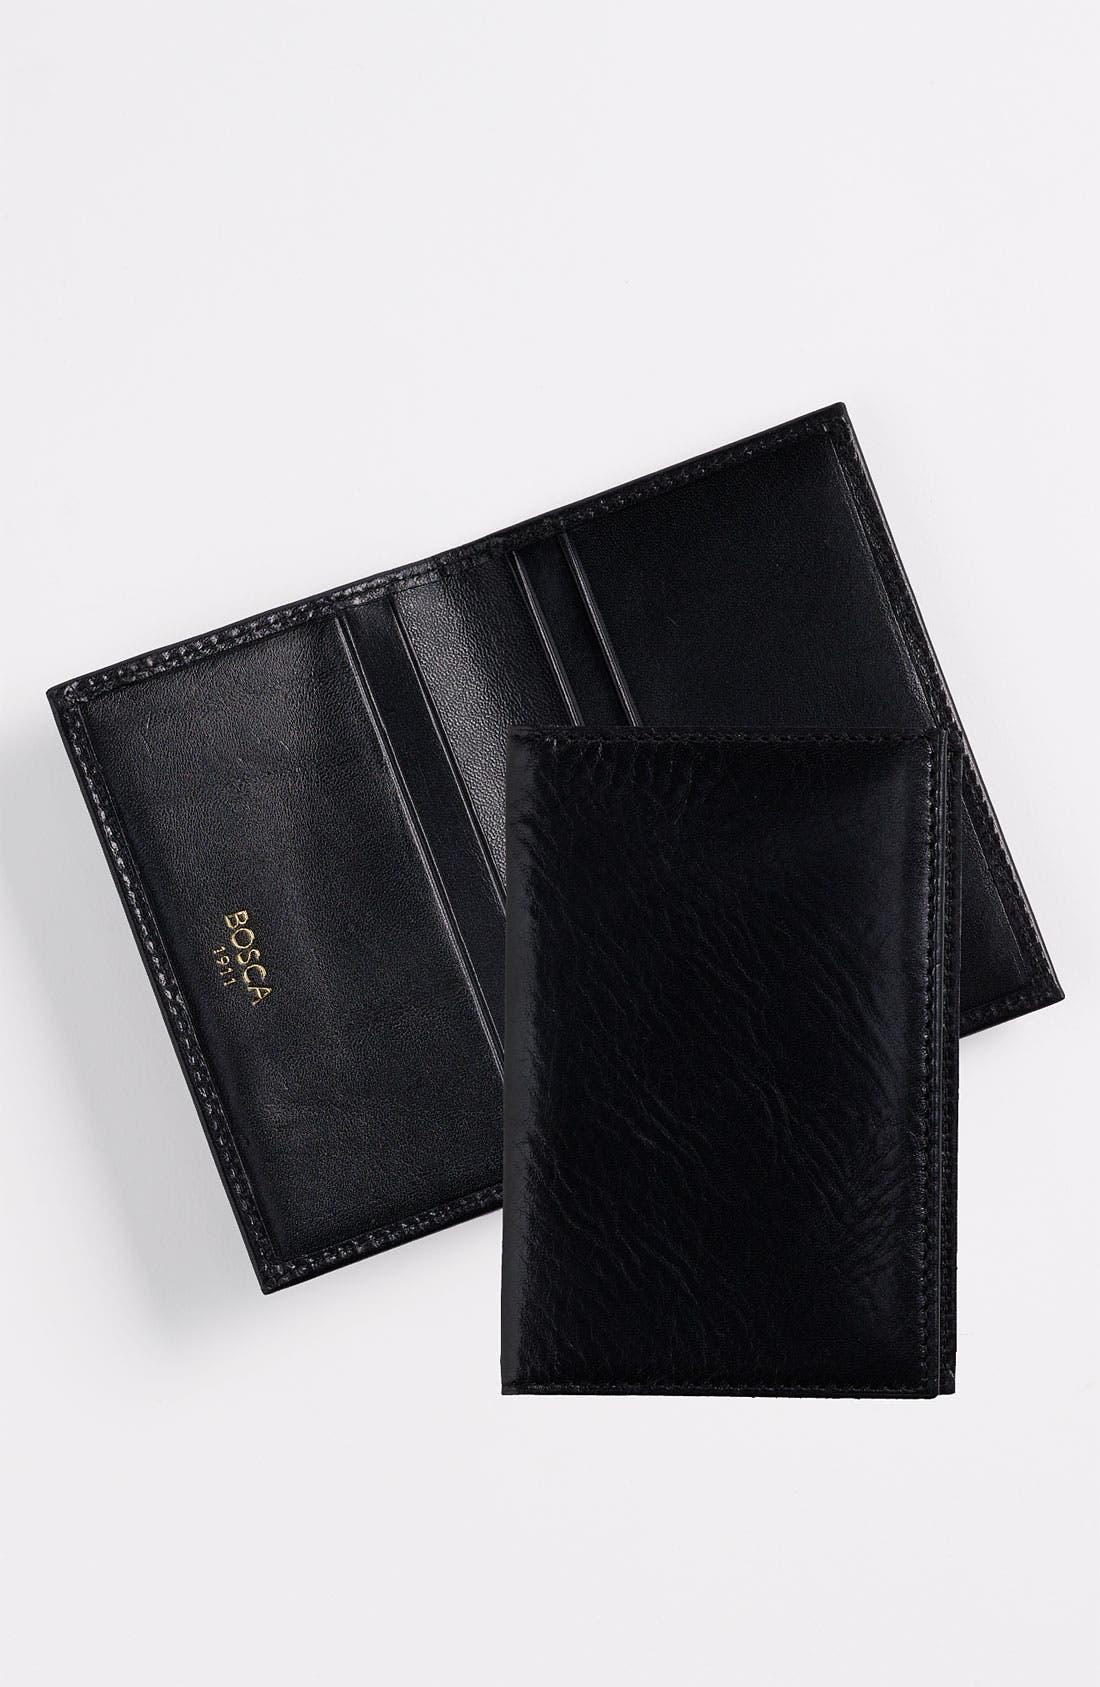 Calling Card Case,                         Main,                         color, BLACK